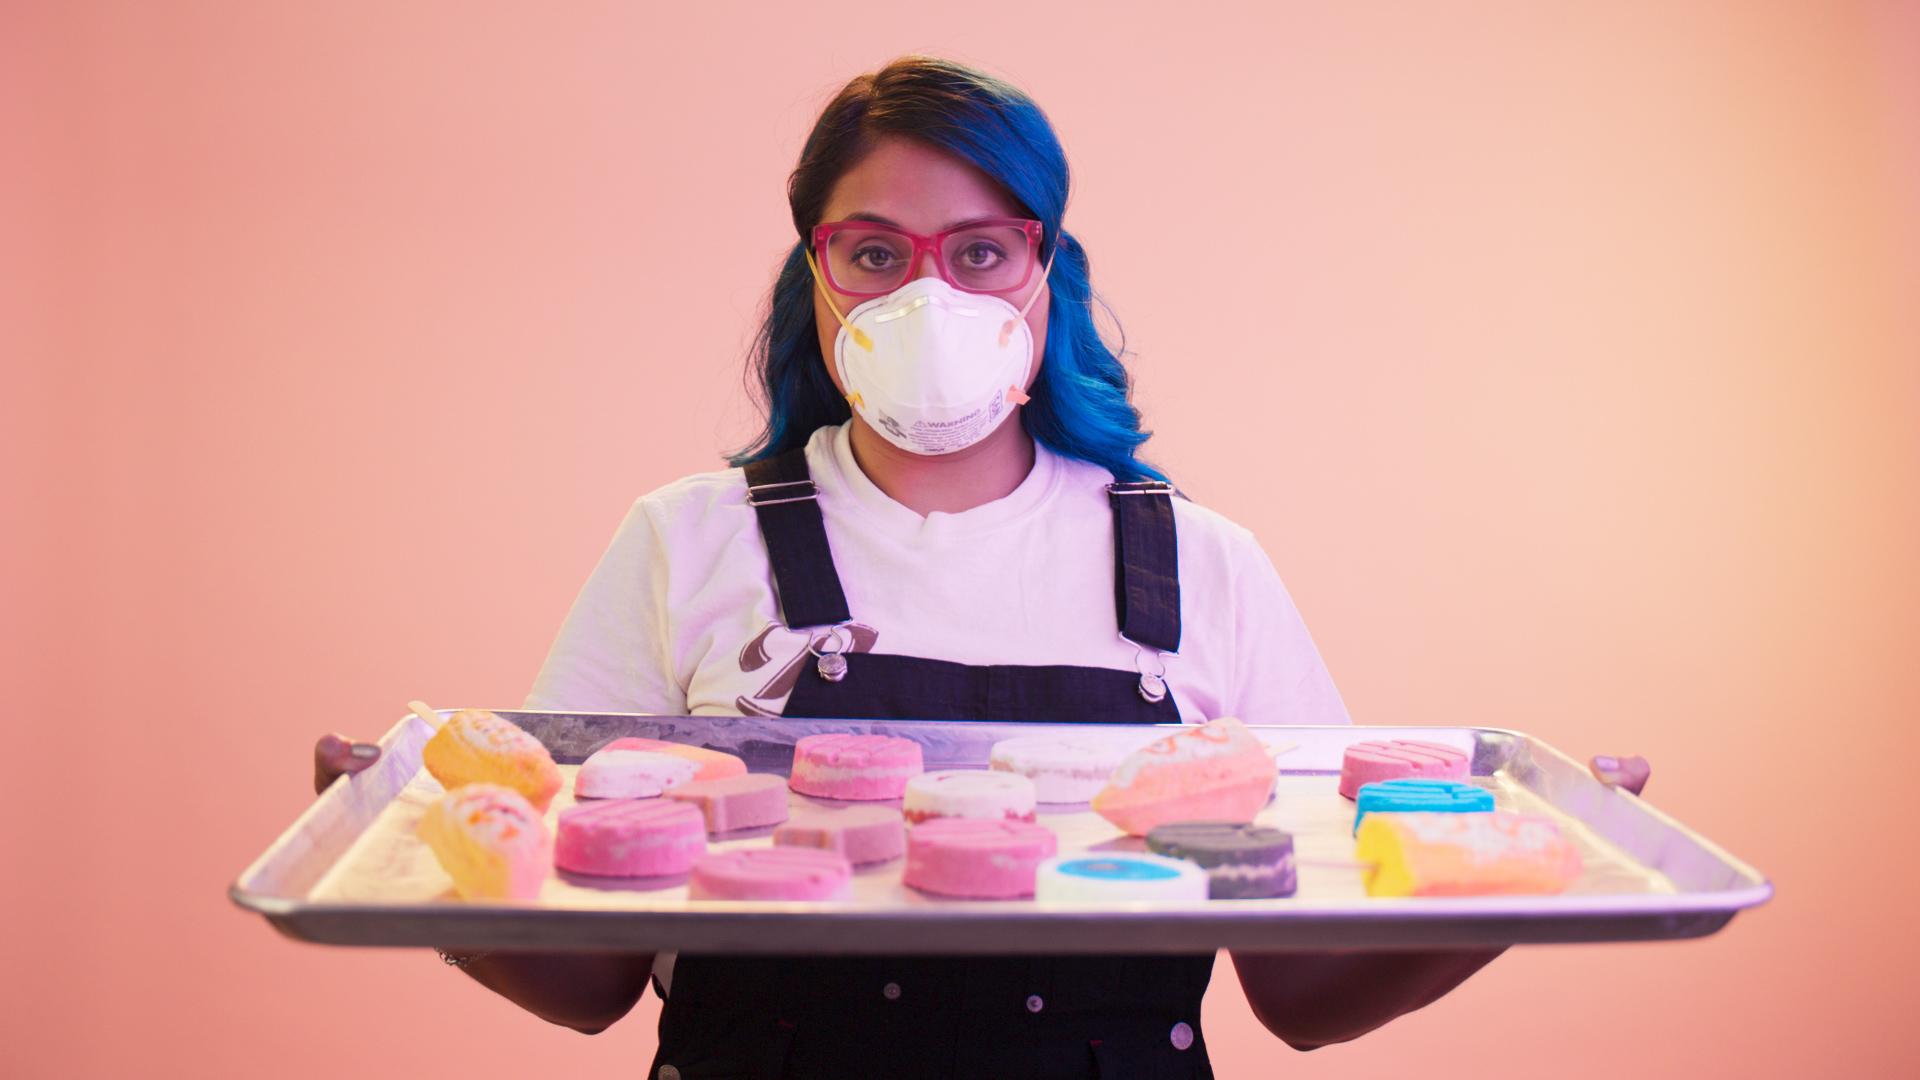 Meet Yamira Venegas, the Entrepreneur Behind the Internet's Favorite Concha Bath Bombs